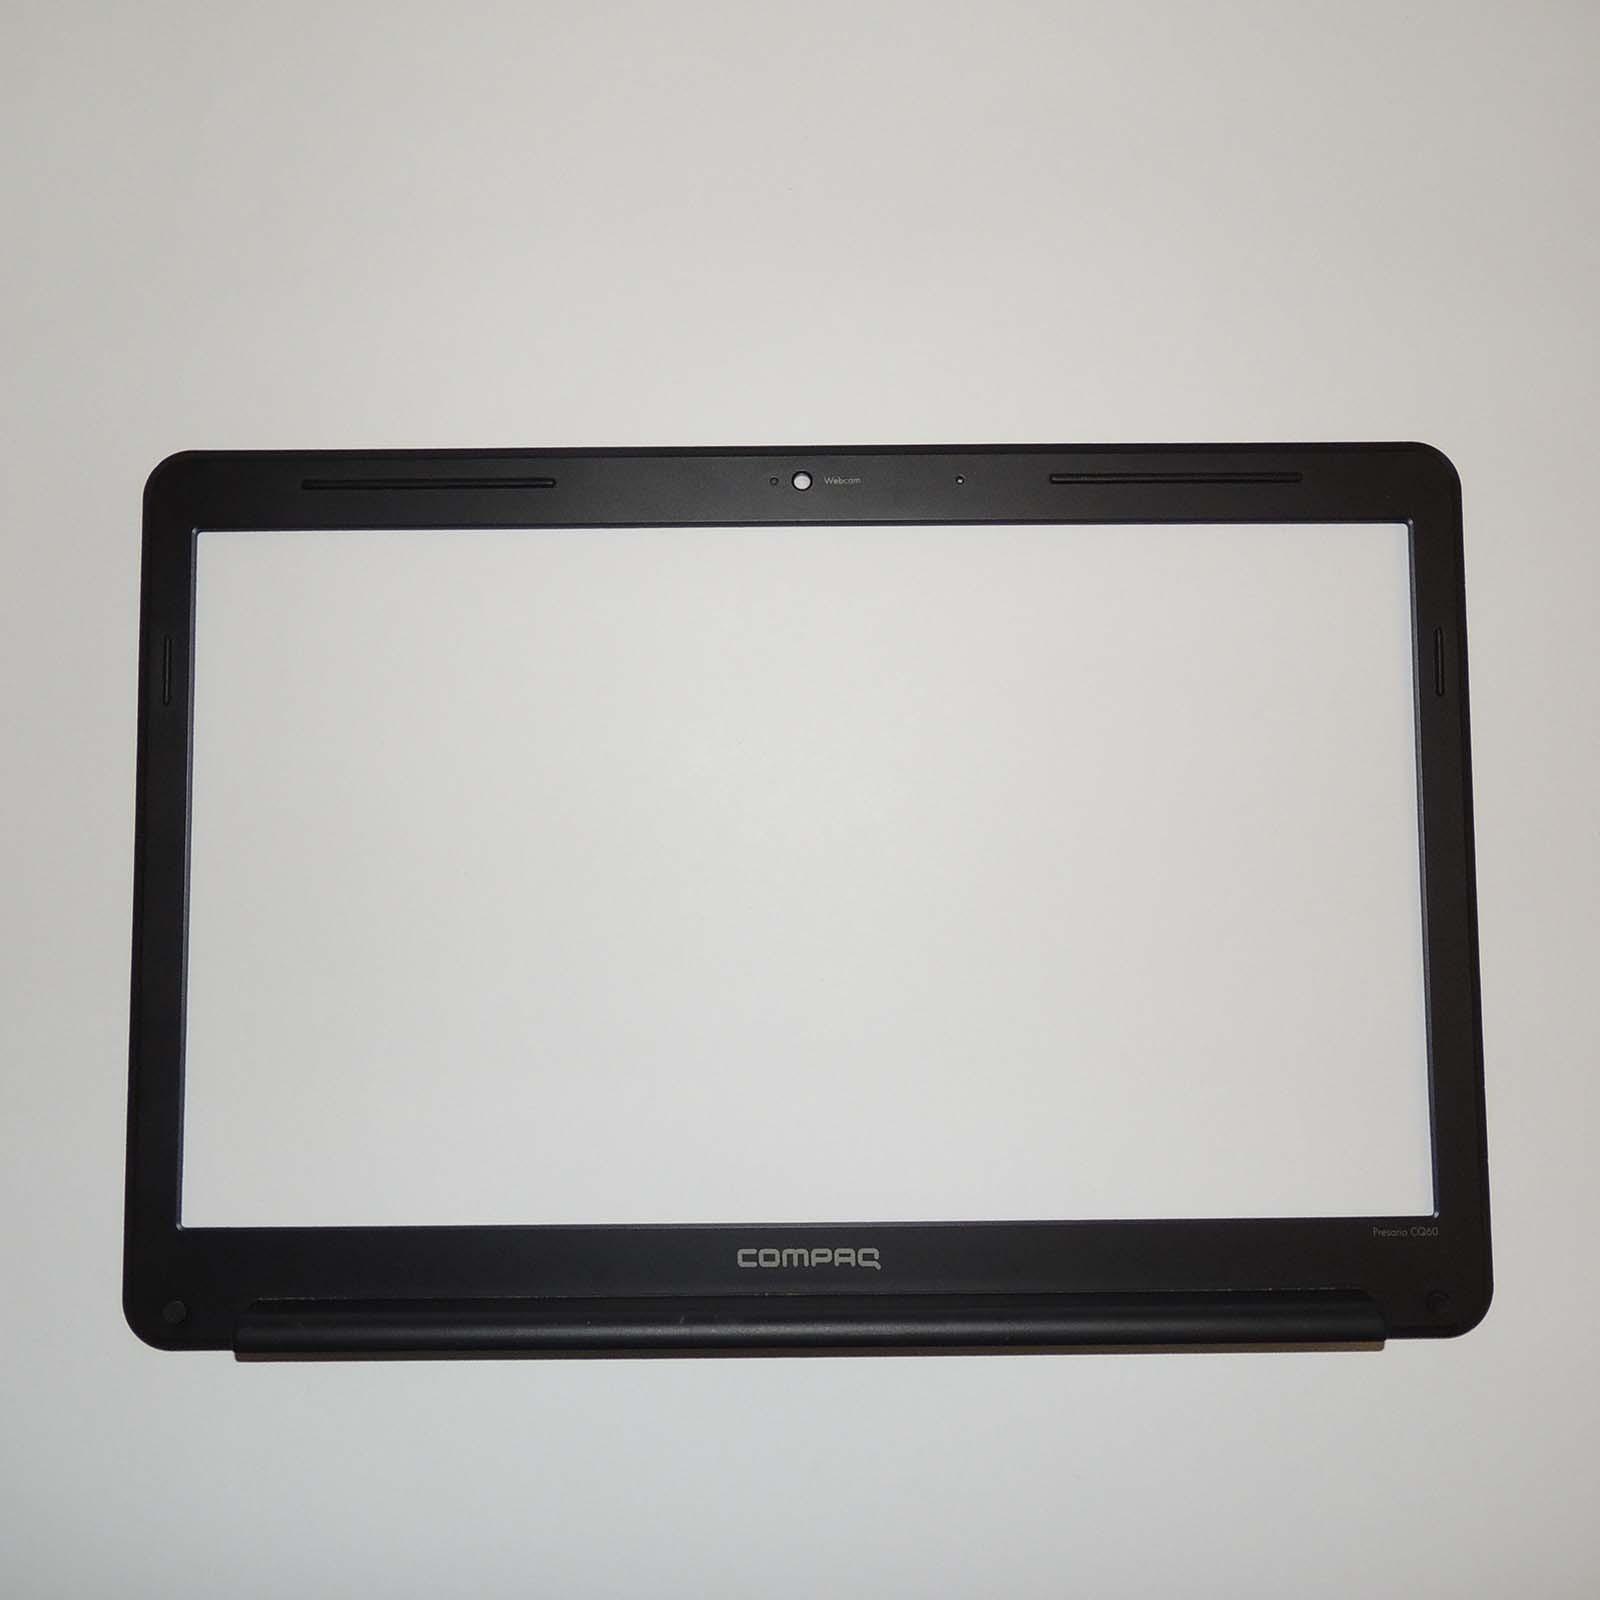 Cornice schermo scocca display HP Compaq CQ60 496768-001